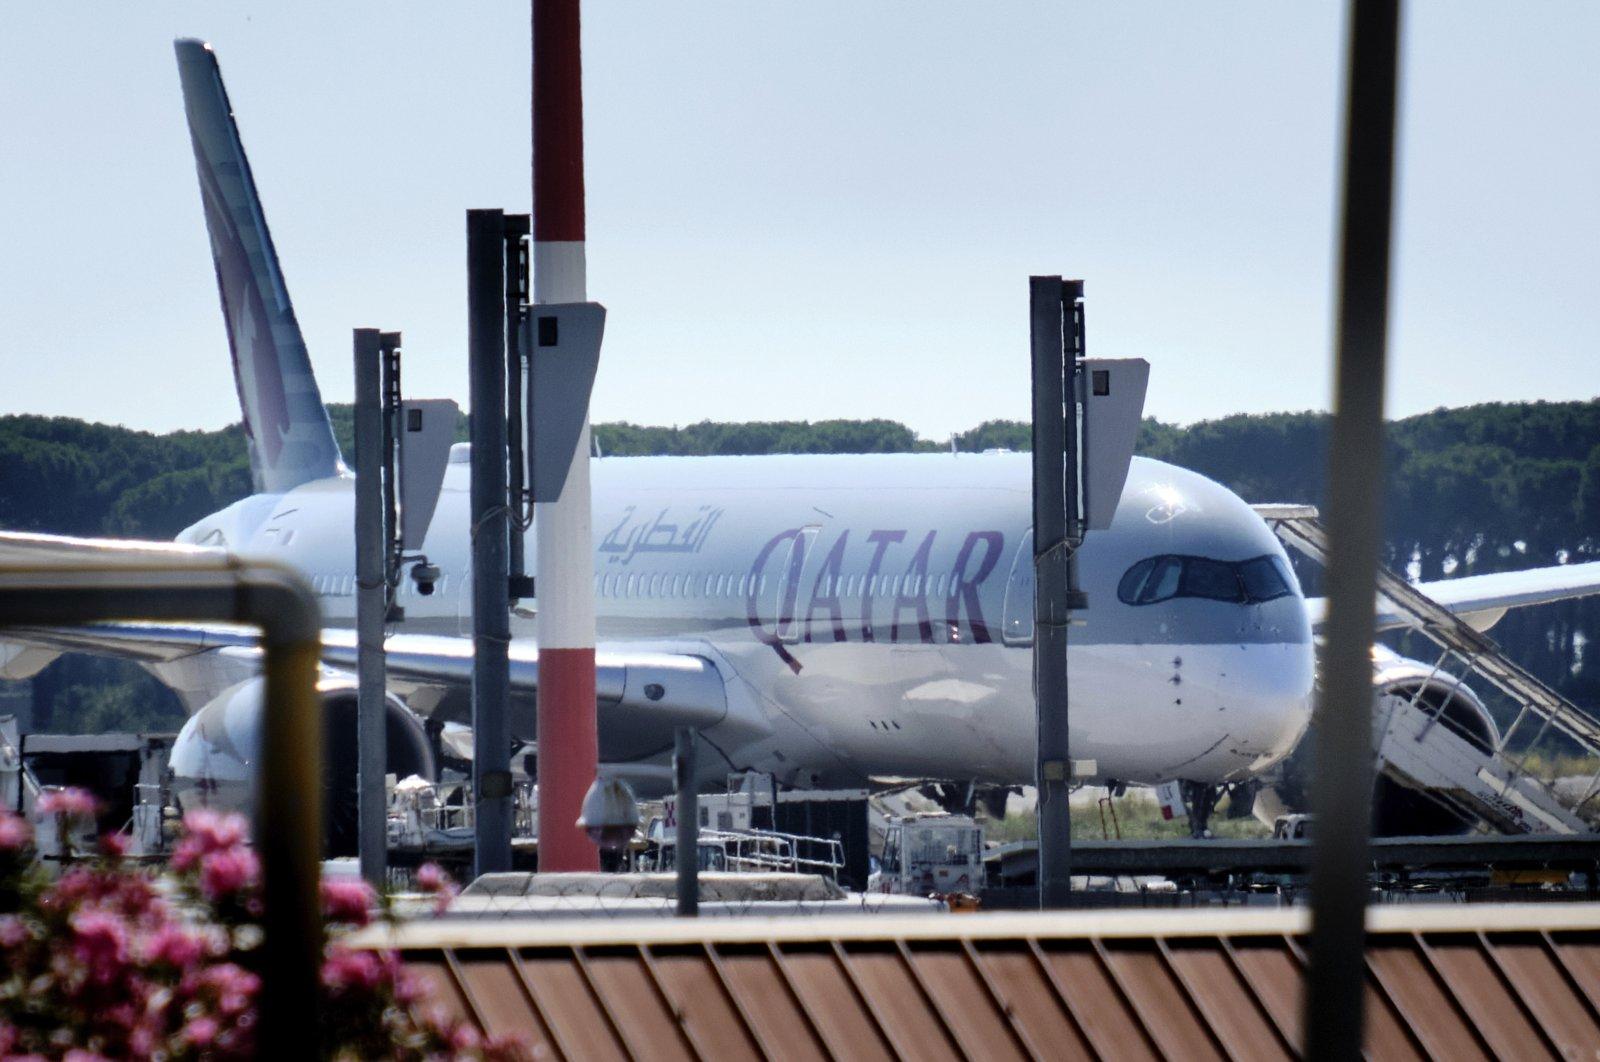 A Qatar Airways aircraft is parked at Rome's Leonardo Da Vinci international airport, July 8, 2020. (LaPresse via AP)